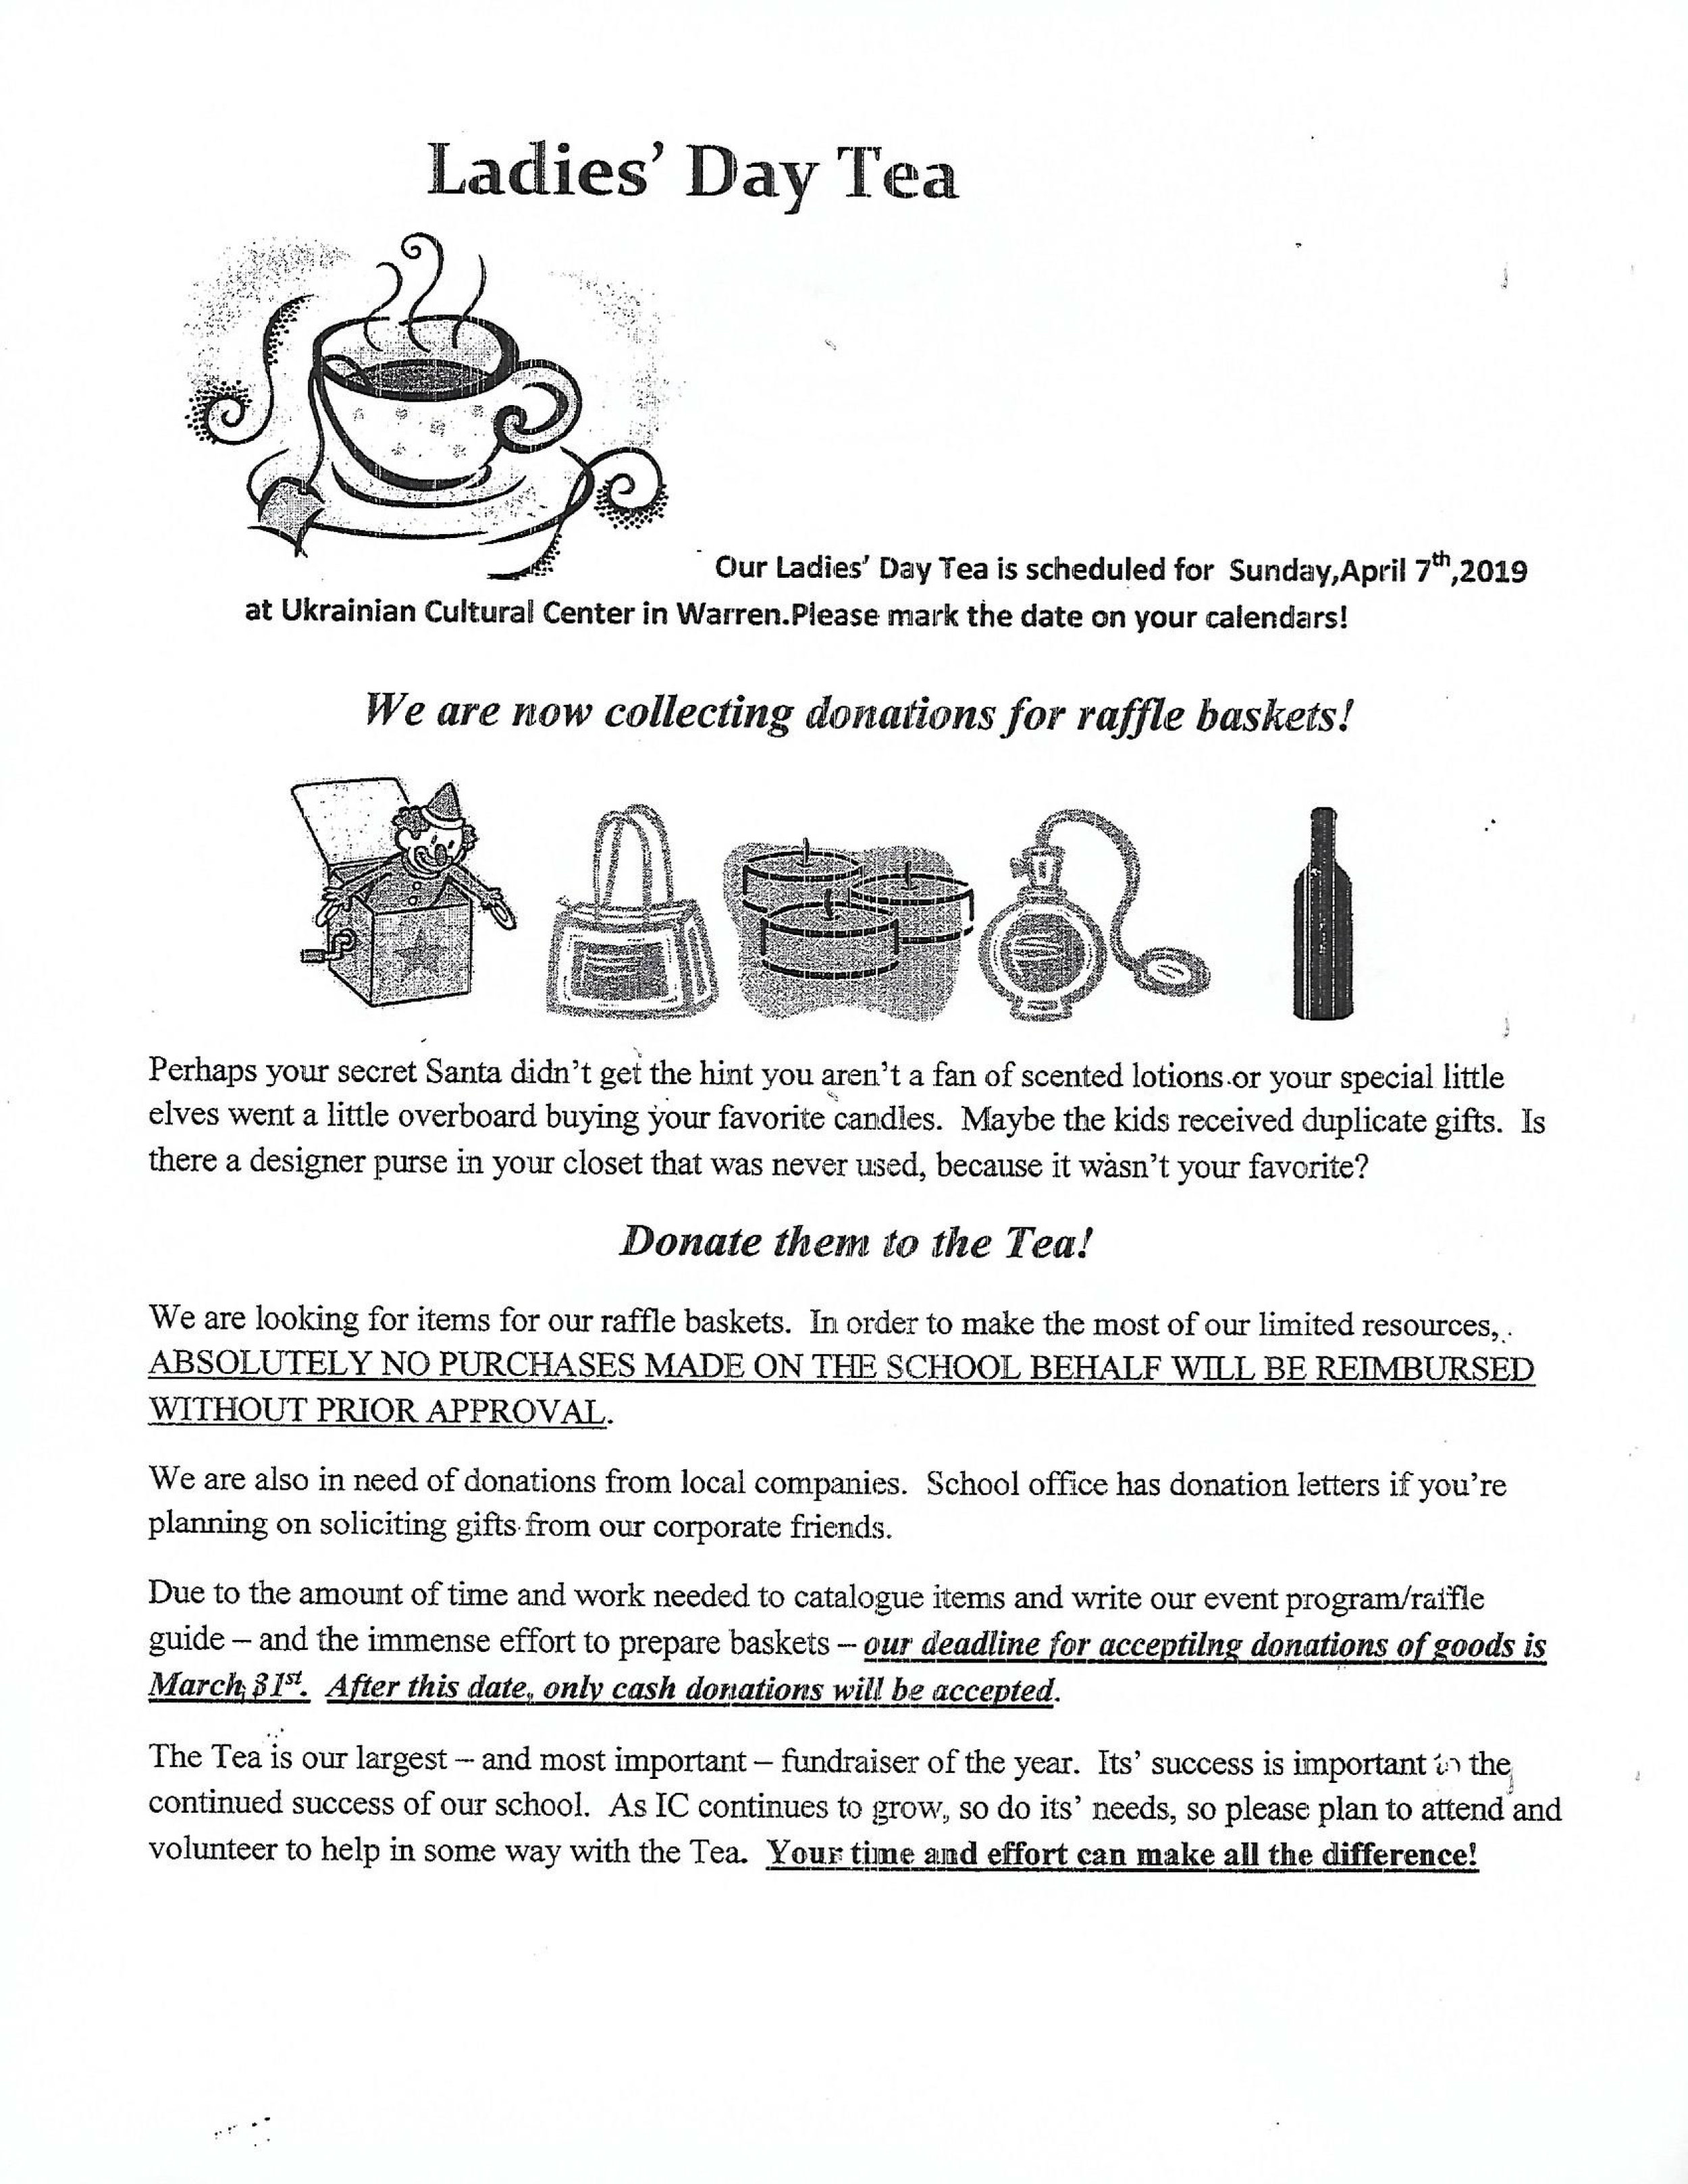 Tea Donations-1.jpg